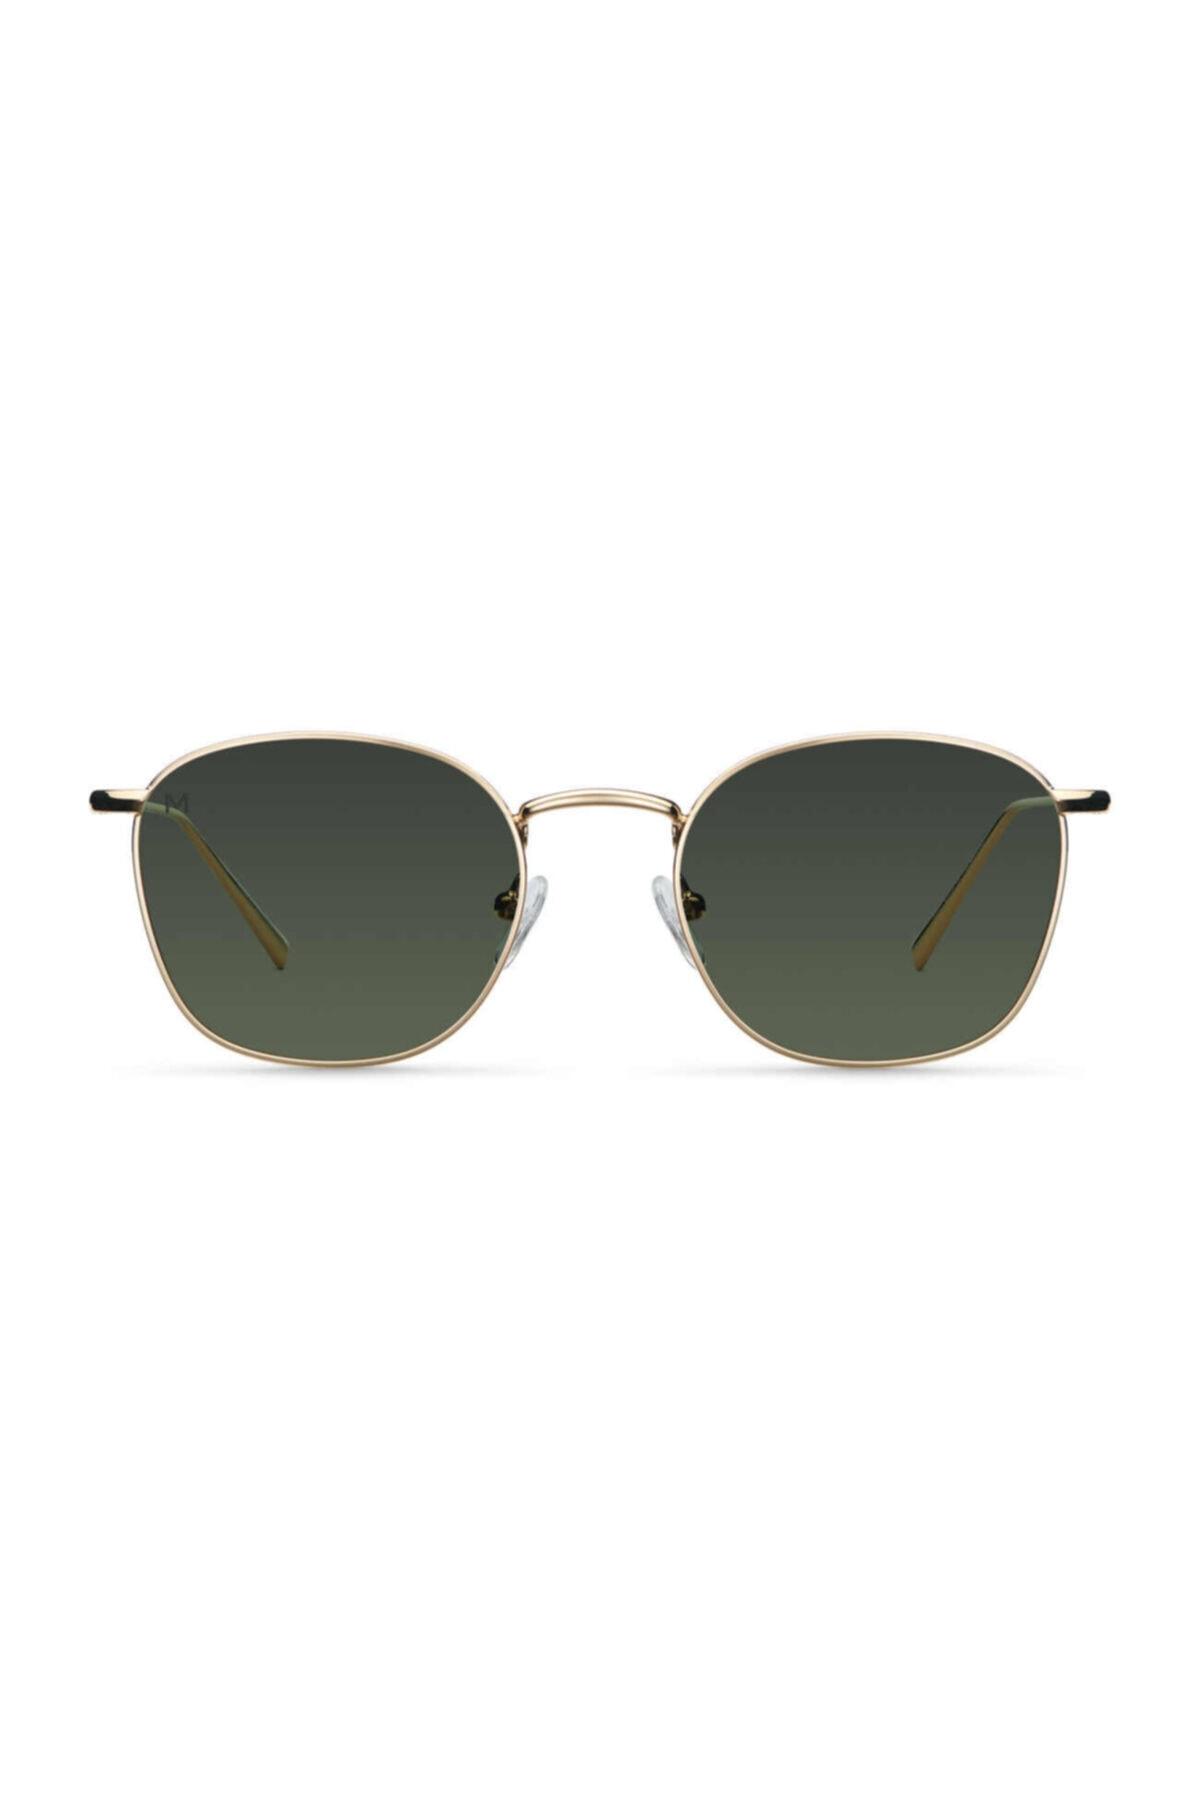 خرید عینک آفتابی  برند MELLER رنگ سبز کد ty67975292